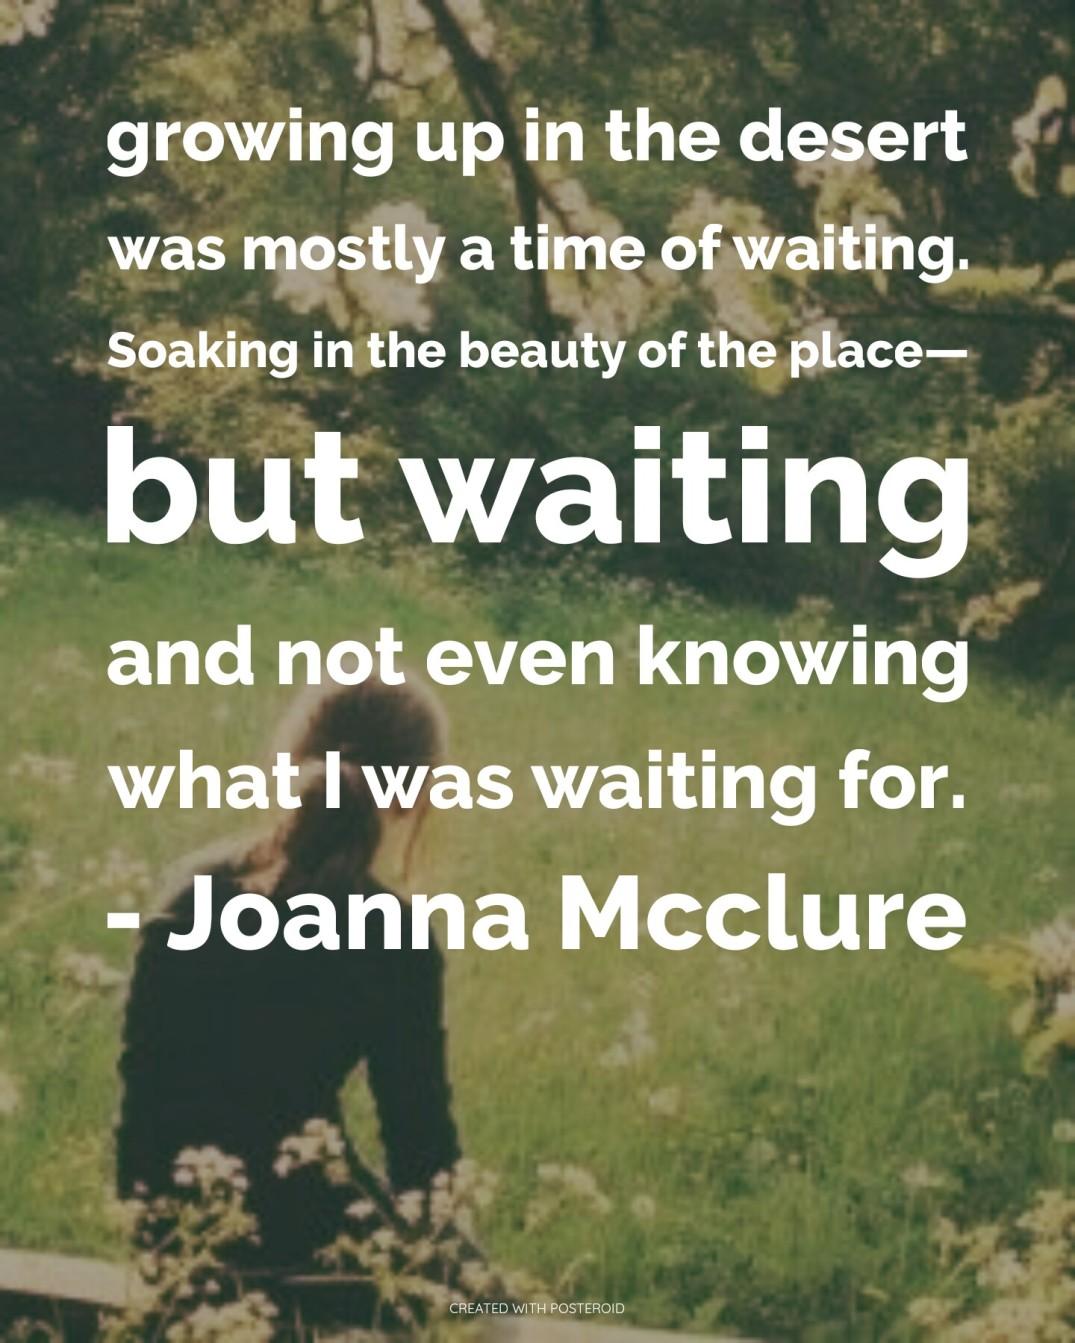 Joanna mcclure poem